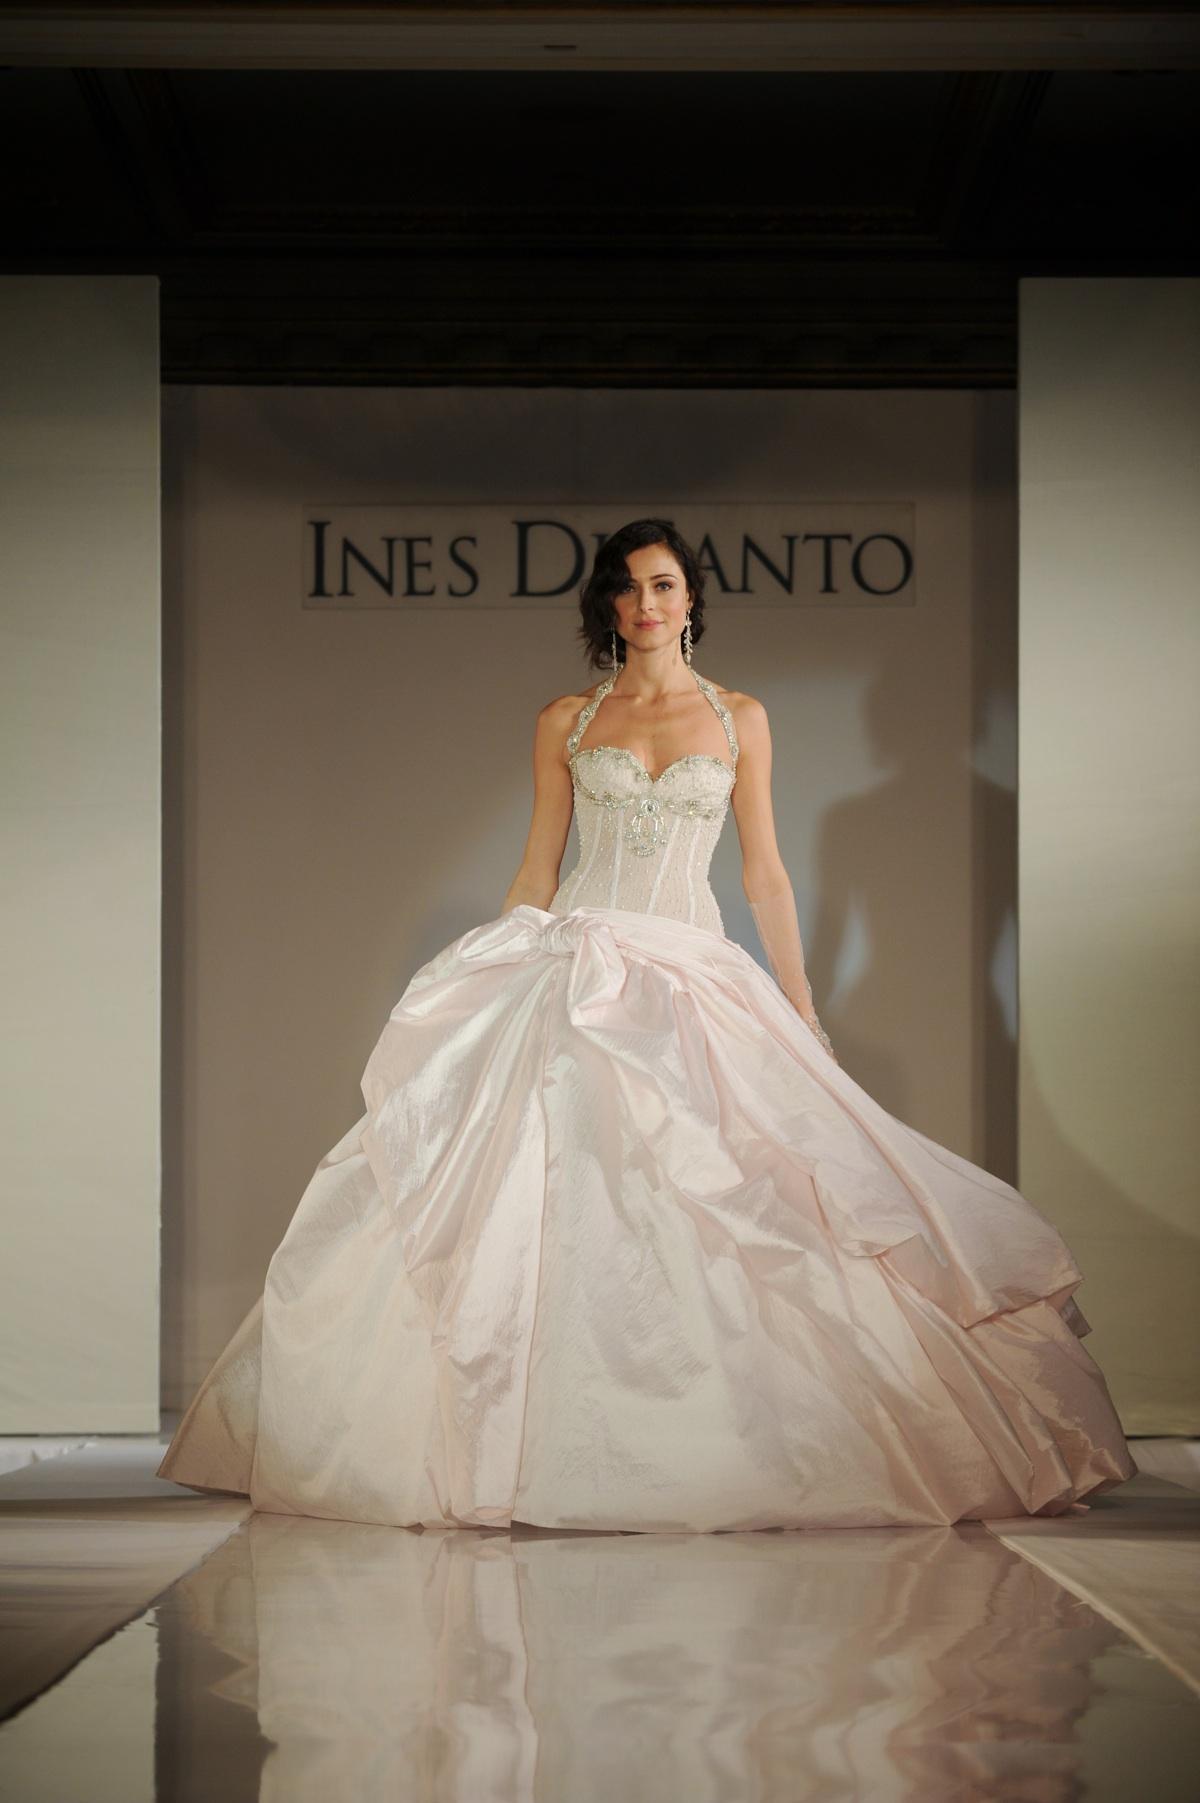 2012 wedding dress trends non white wedding dresses for Ines di santo wedding dress